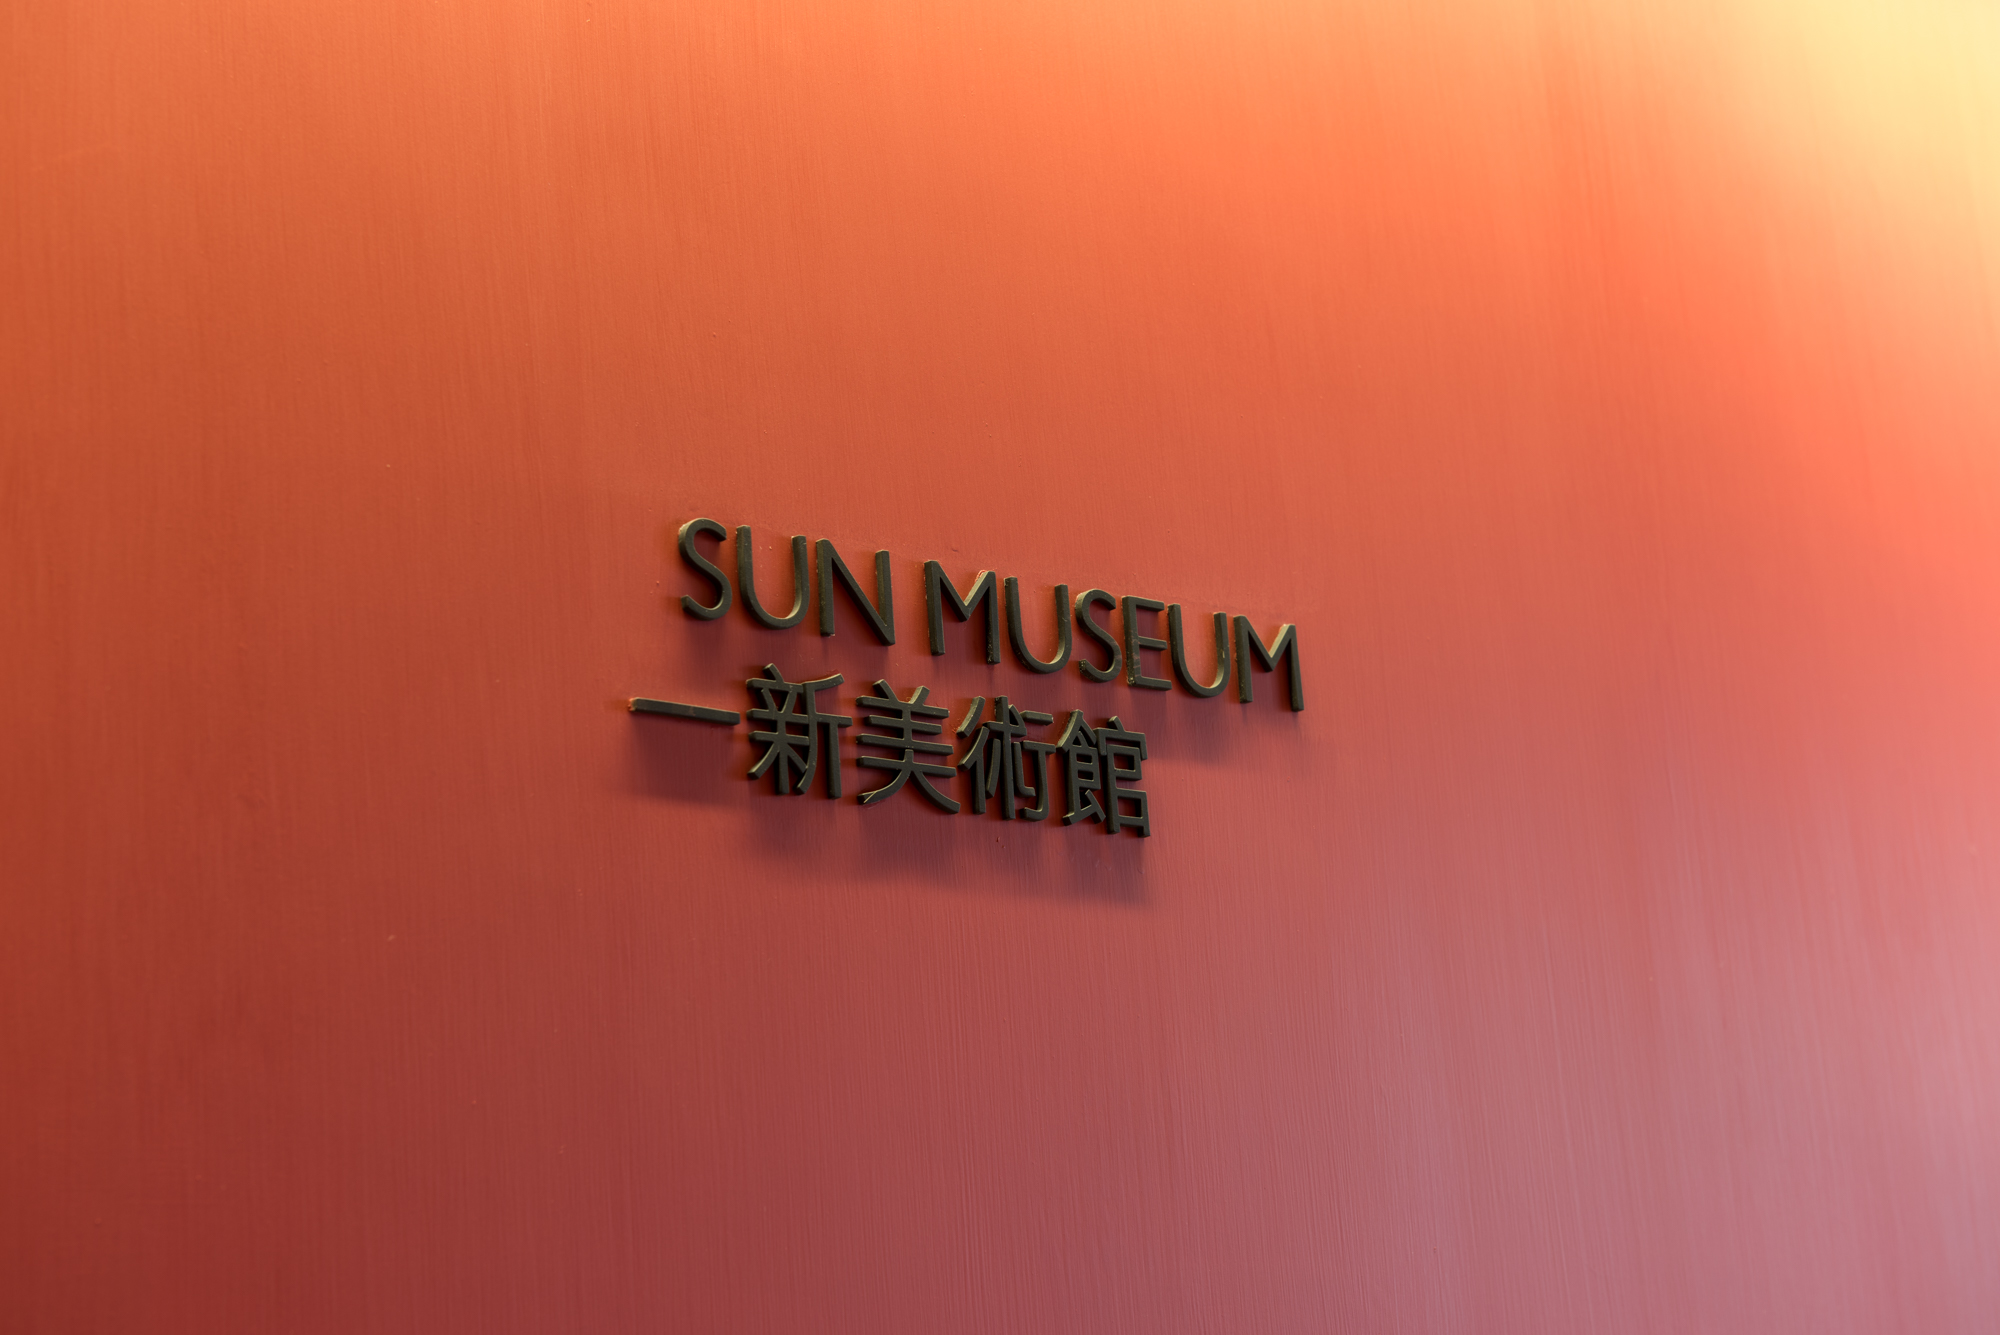 Sun_Museum_interior1.jpg